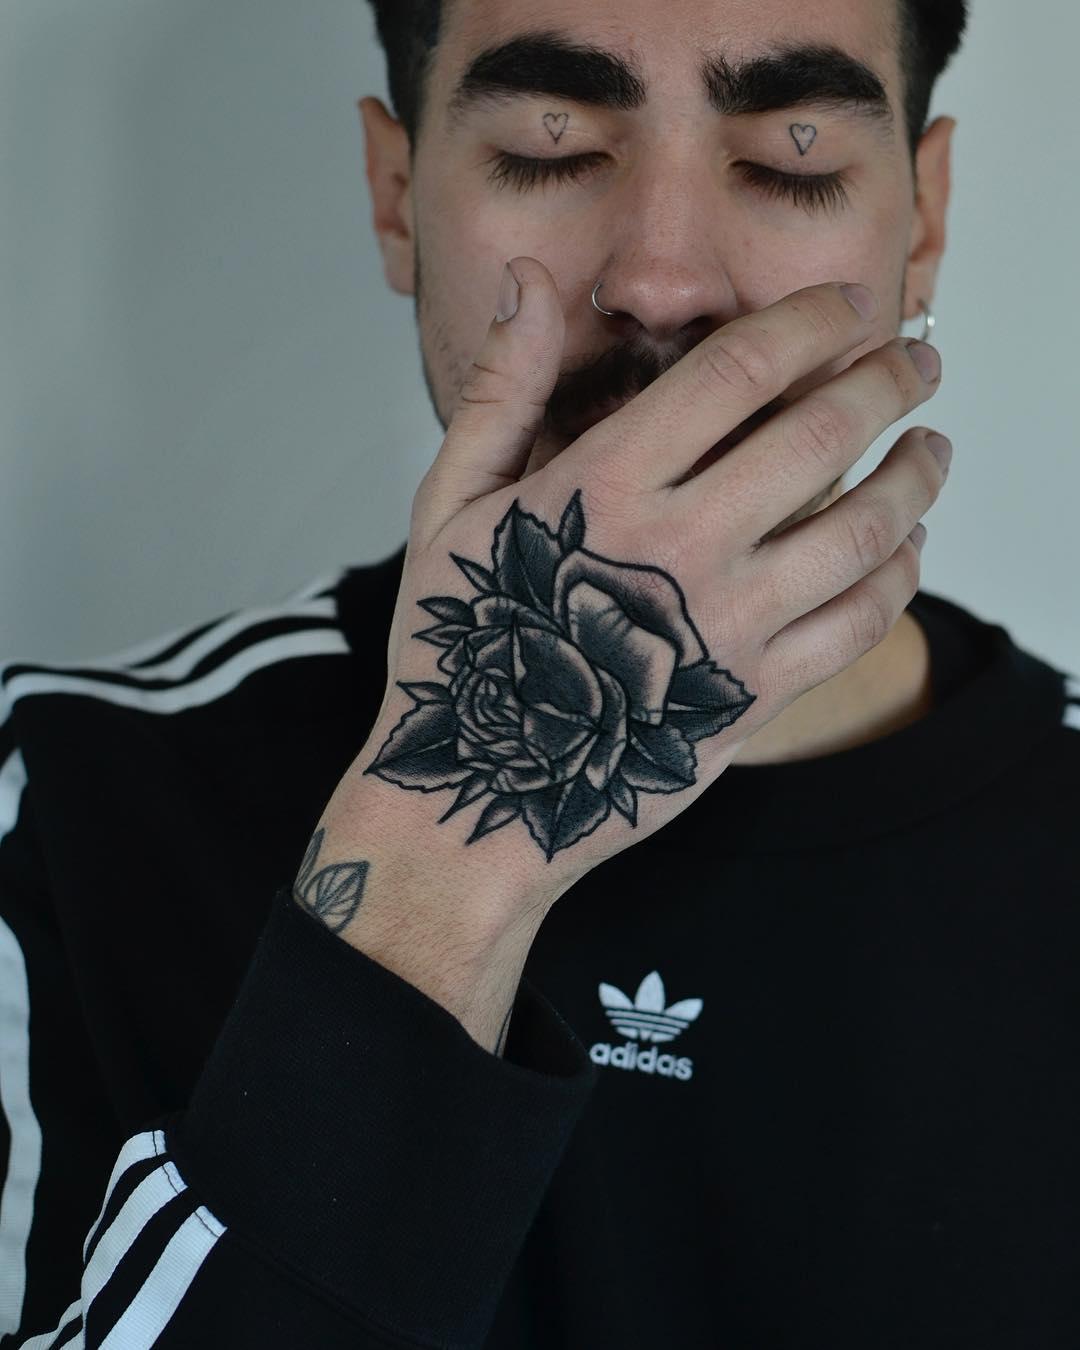 Blackwork rose by @tototatuer